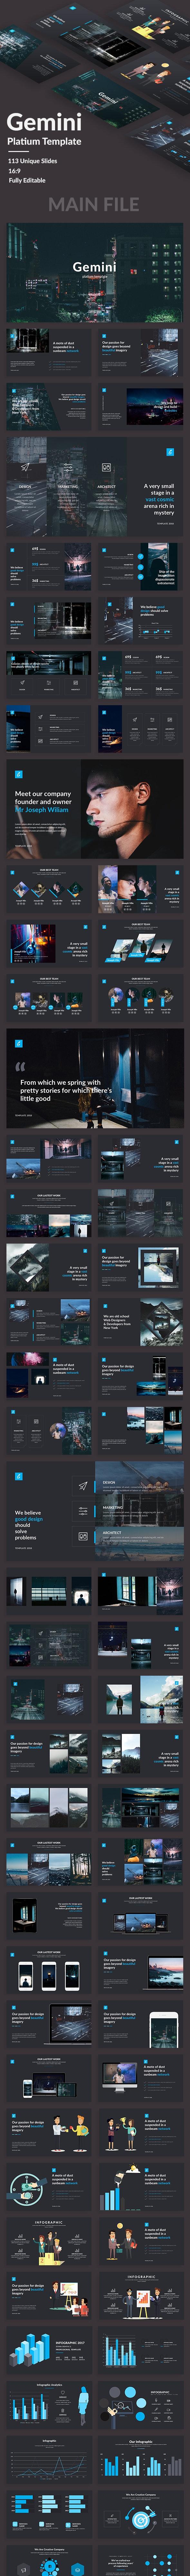 Gemini Platium Google Slide Template - Google Slides Presentation Templates